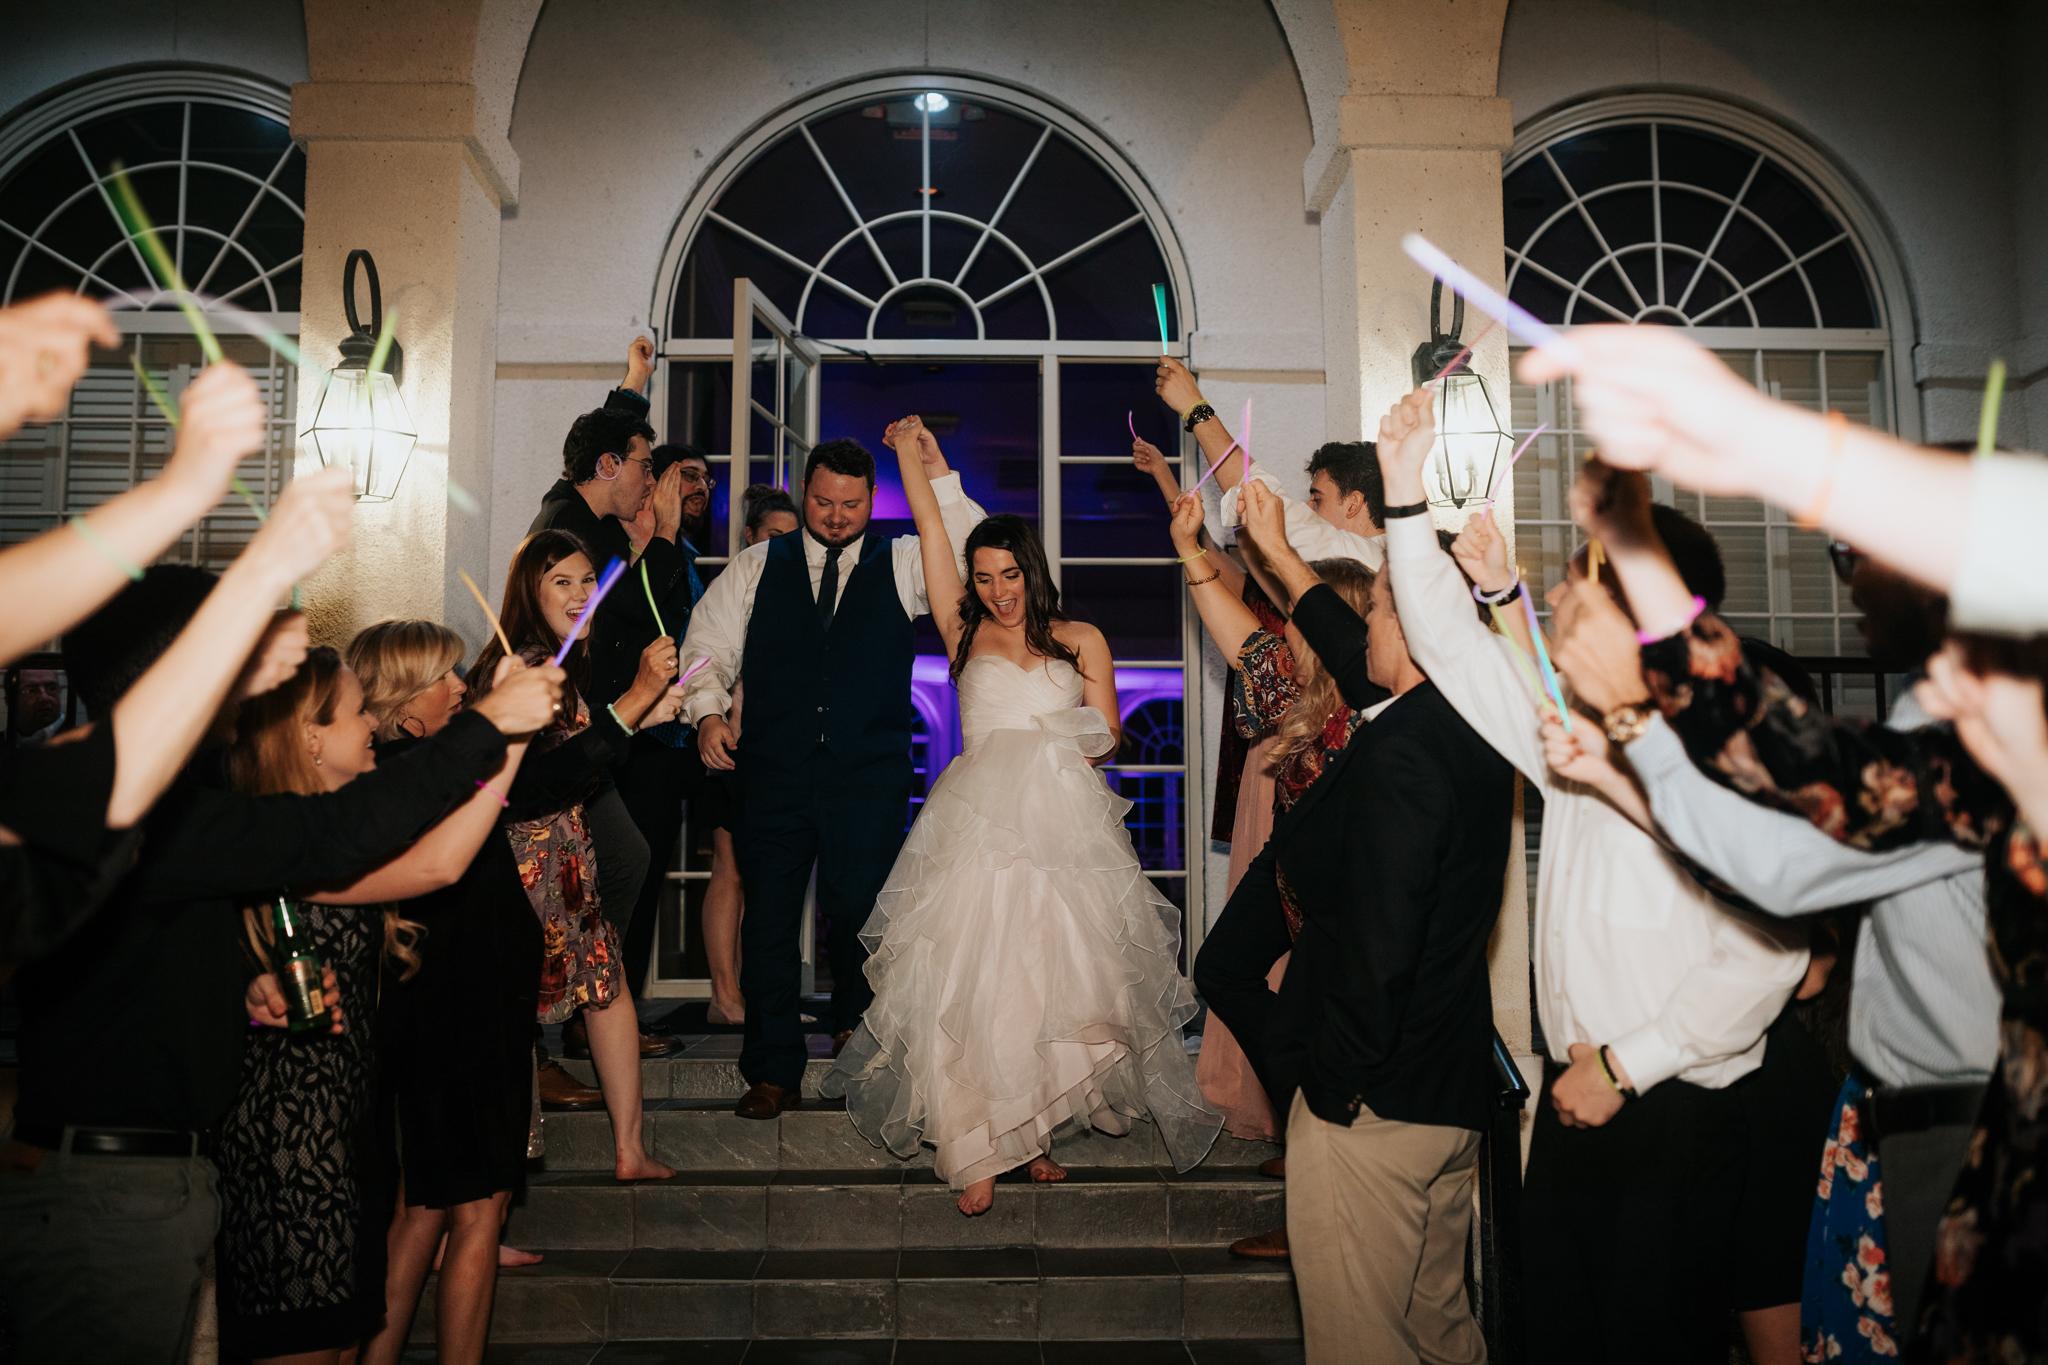 Leah Nicole Photography - Houston Wedding Photographer-Lake Conroe Wedding- Houston Wedding Photographer-56.jpg